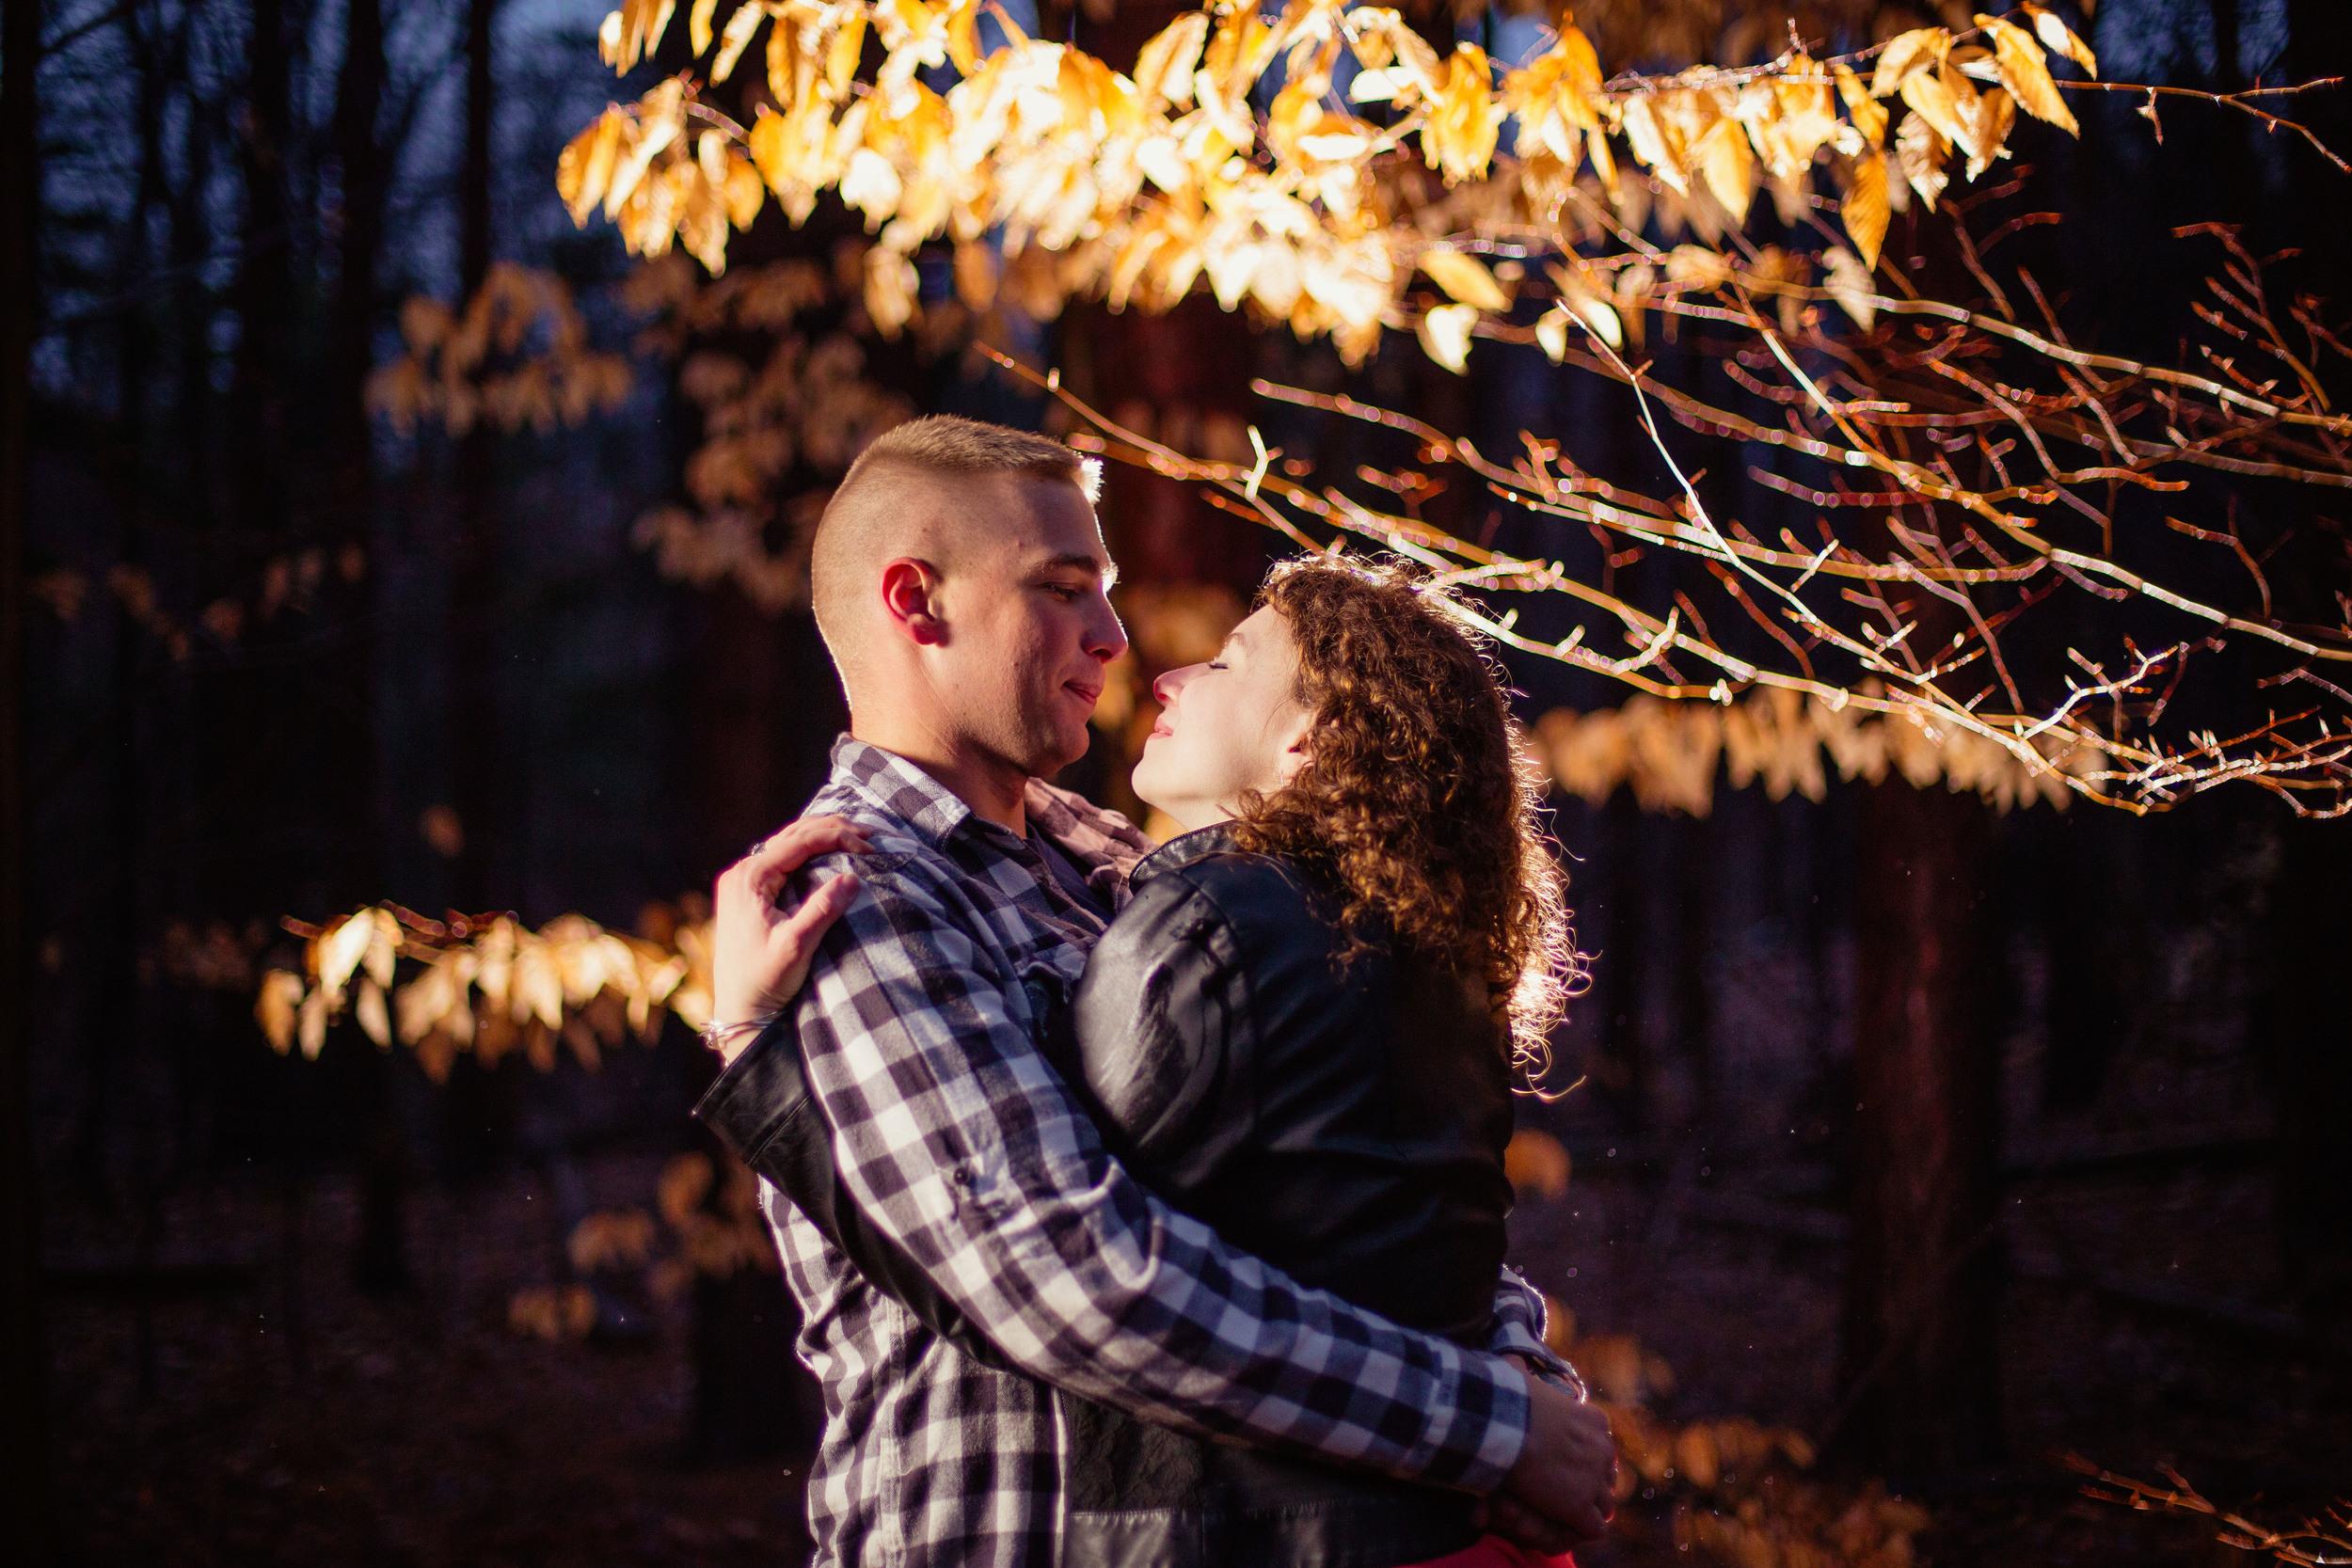 Megan-Brandon-Engagement-Stefan-Ludwig-Photography-Buffalo-NY-Chestnut-Ridge-Park-60-x.jpg